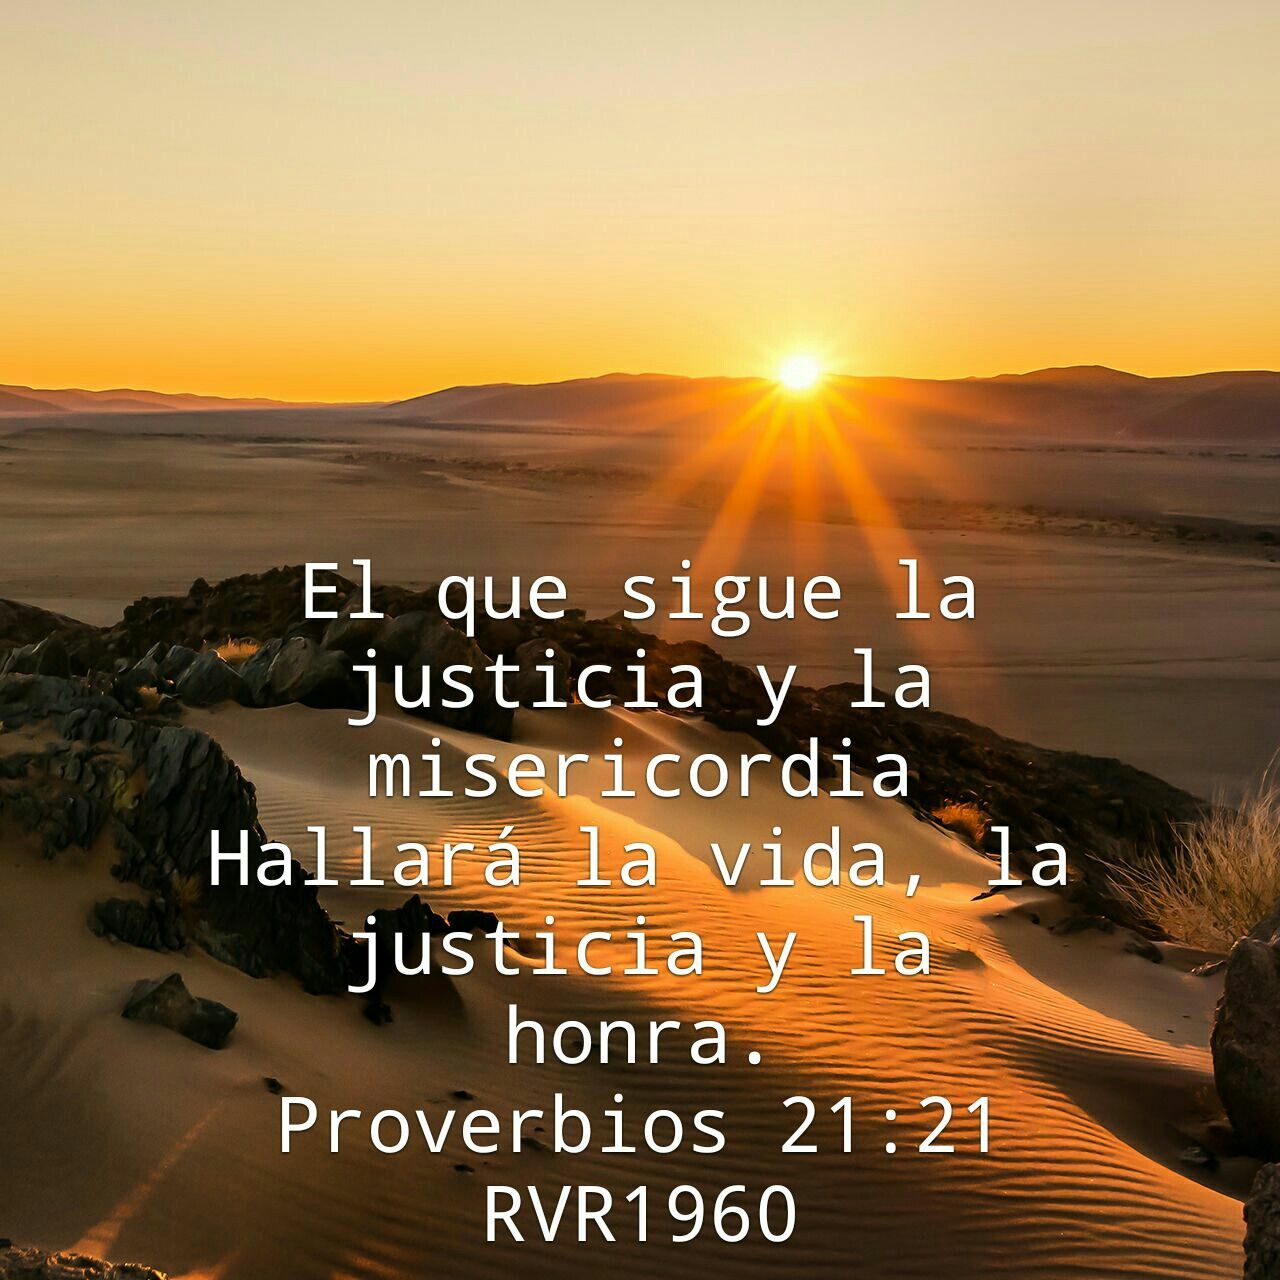 Proverbios 21:21